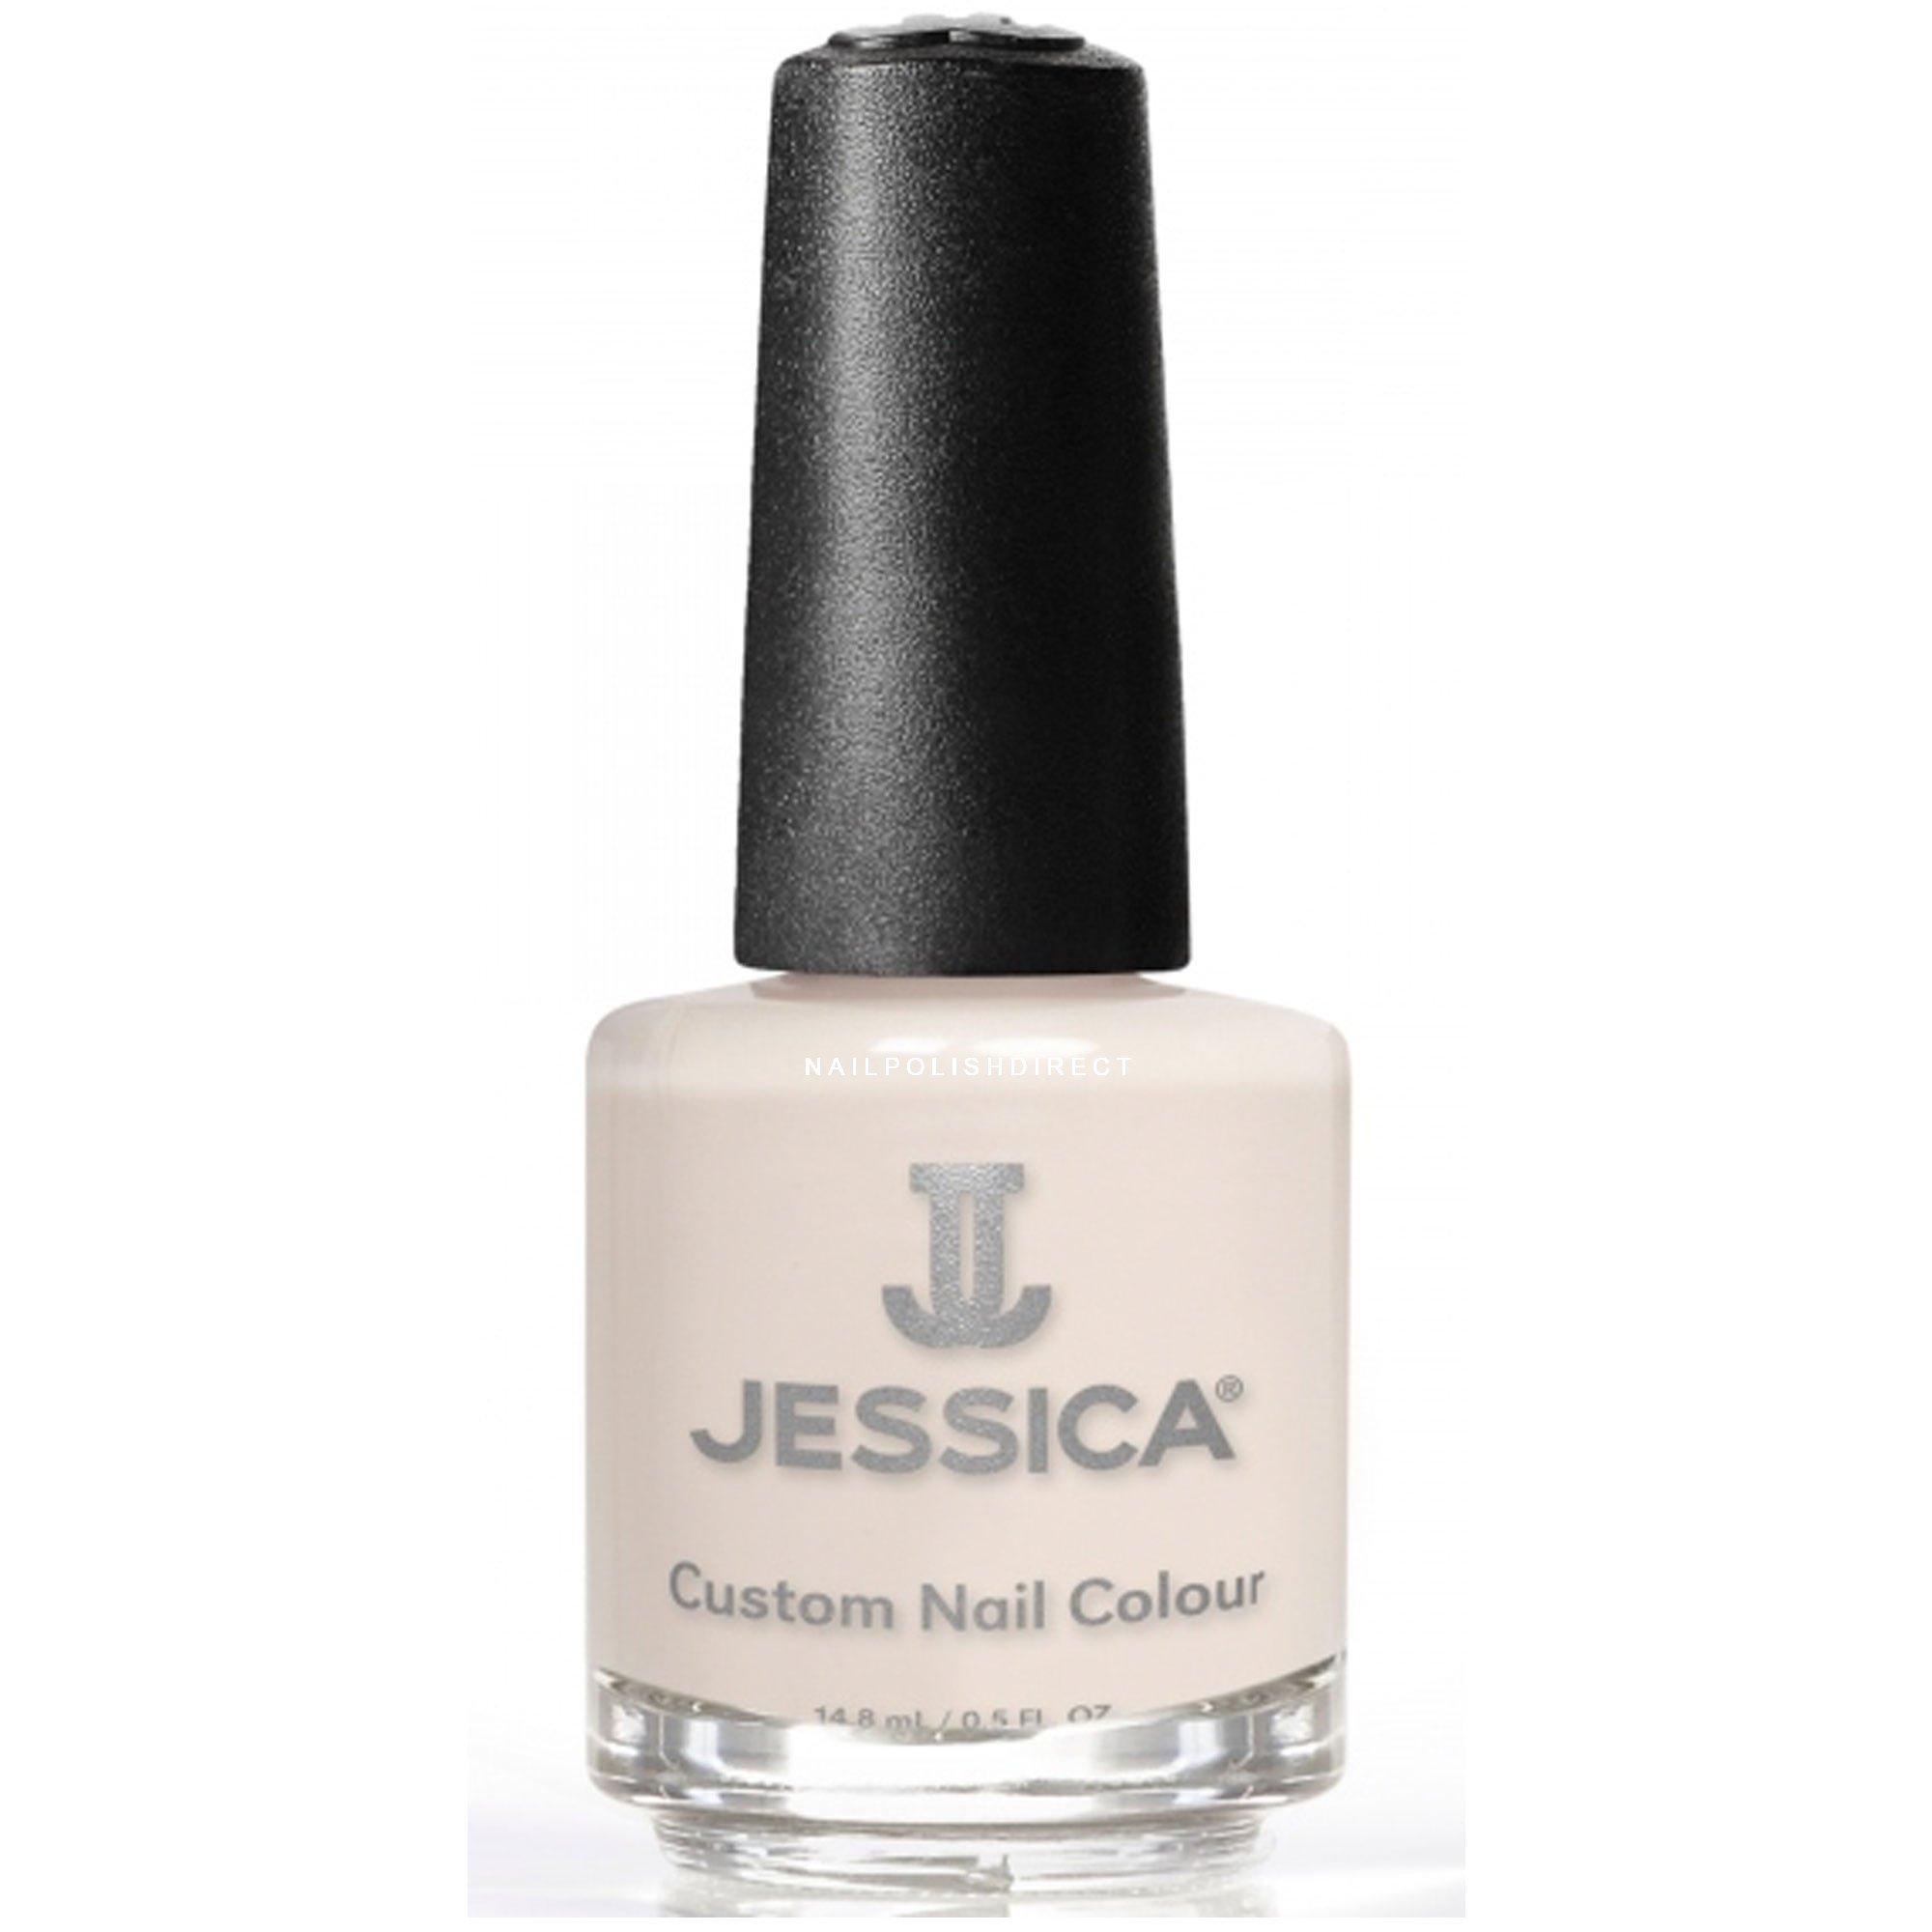 Jessica nail polish pret a porter 684 for Pret a porter uk